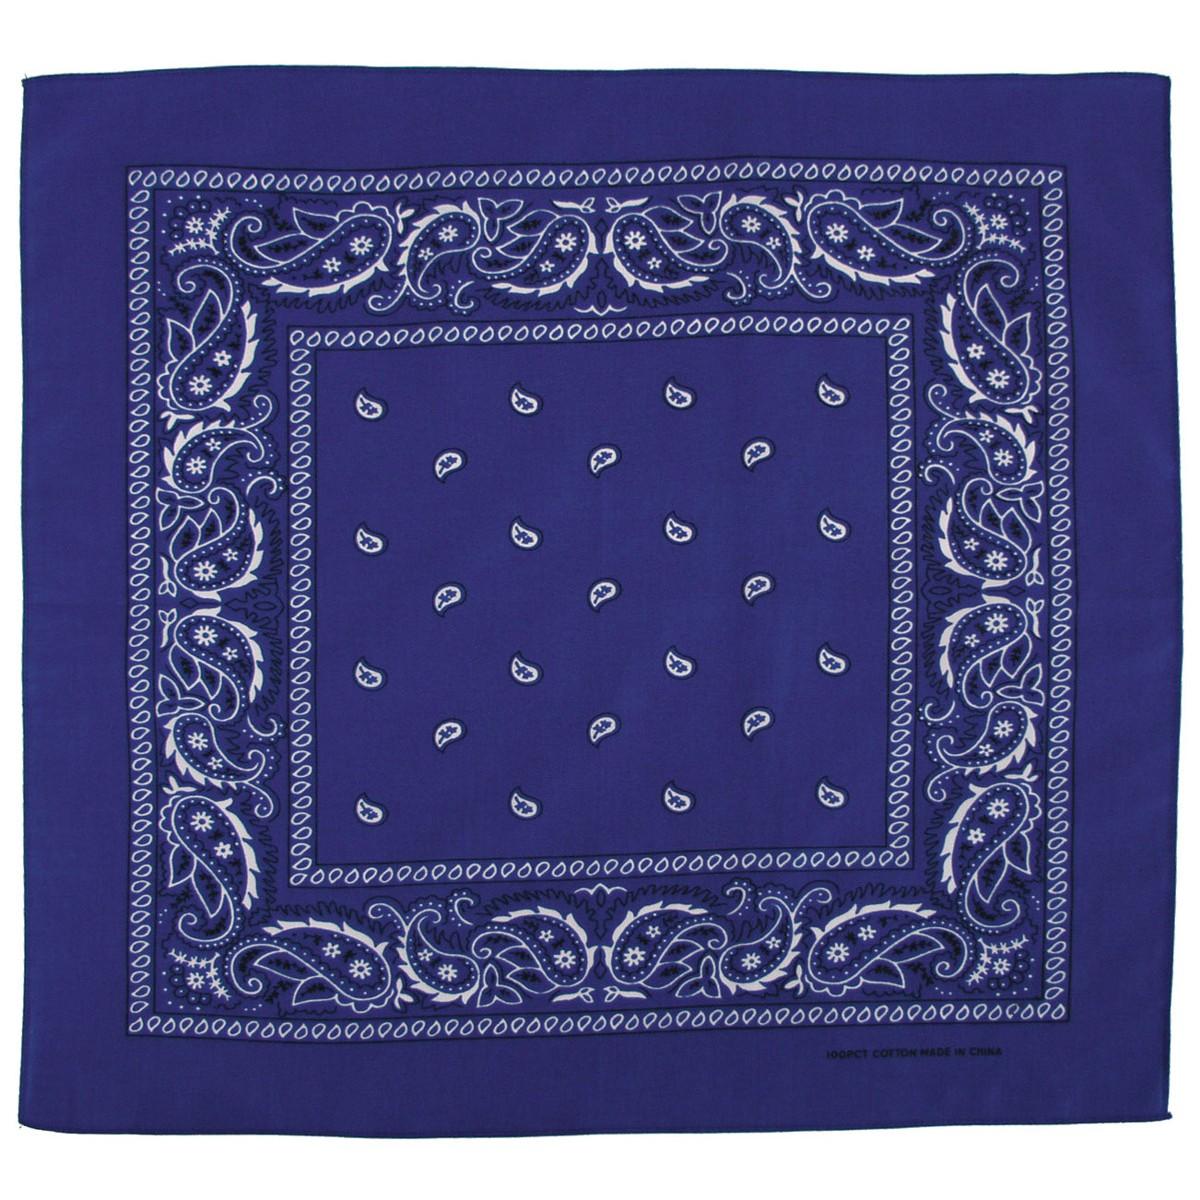 Bandana šátek - modrý